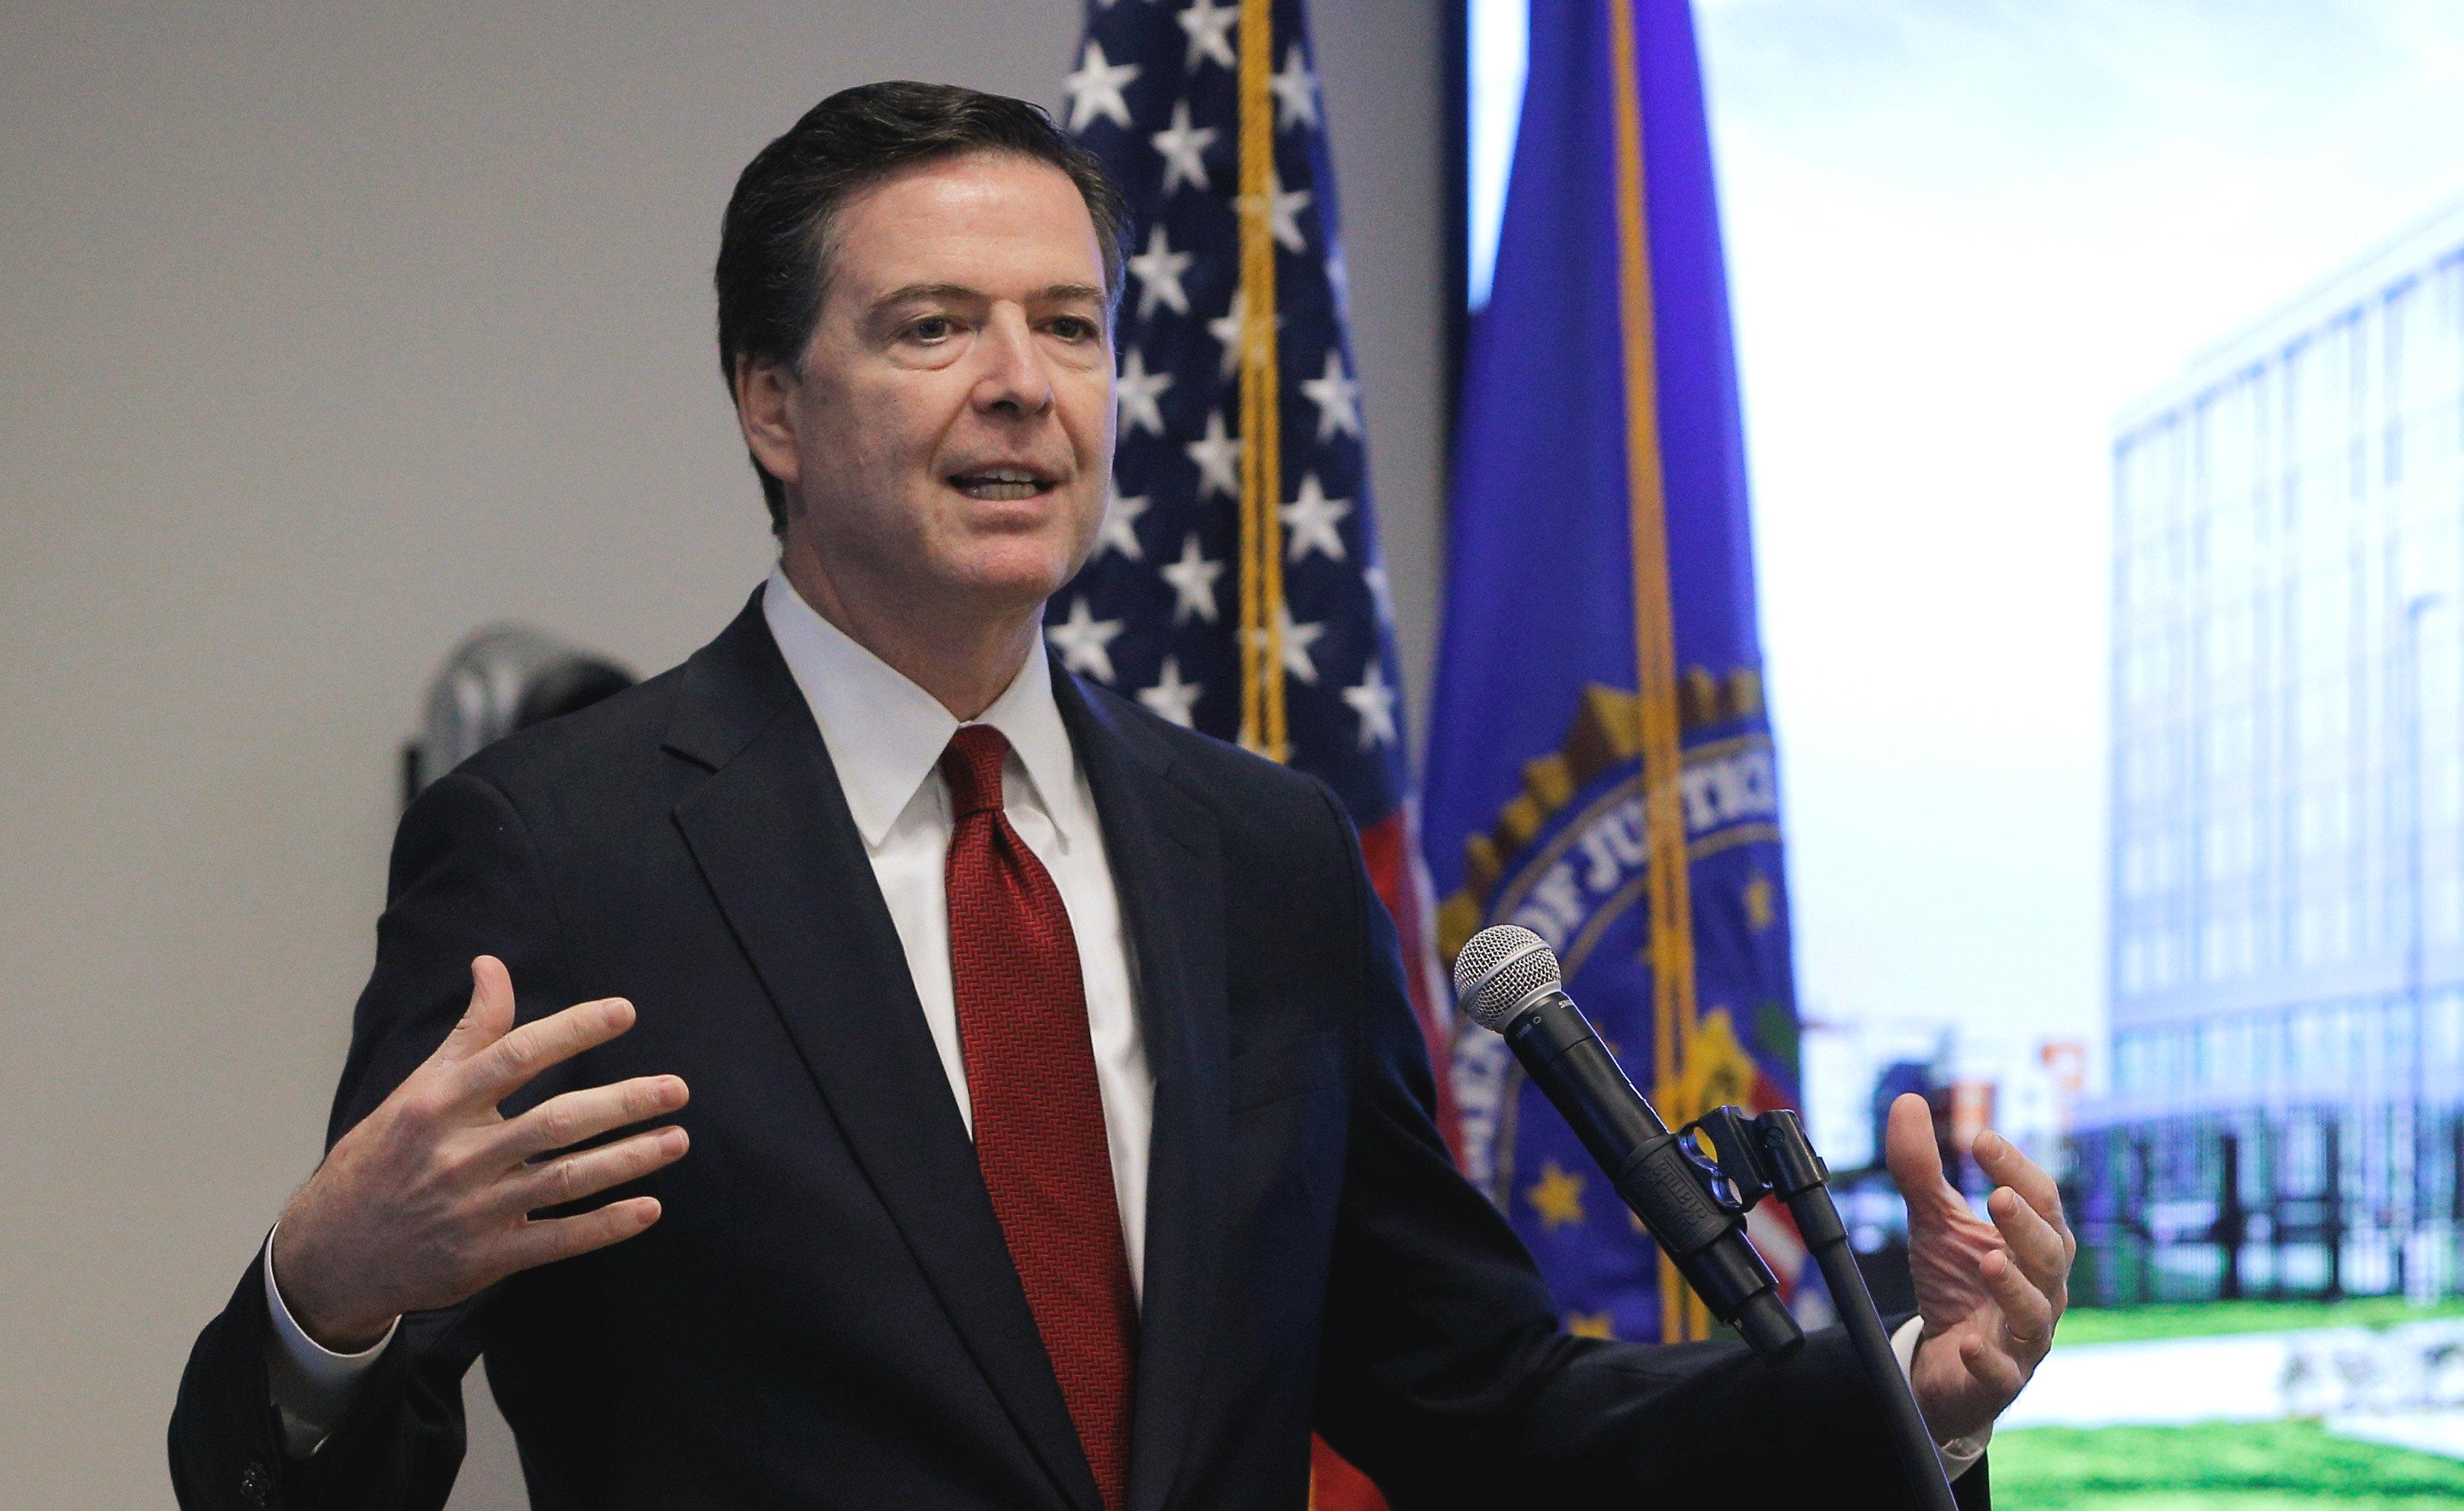 Can Trump Fire FBI Director James Comey?